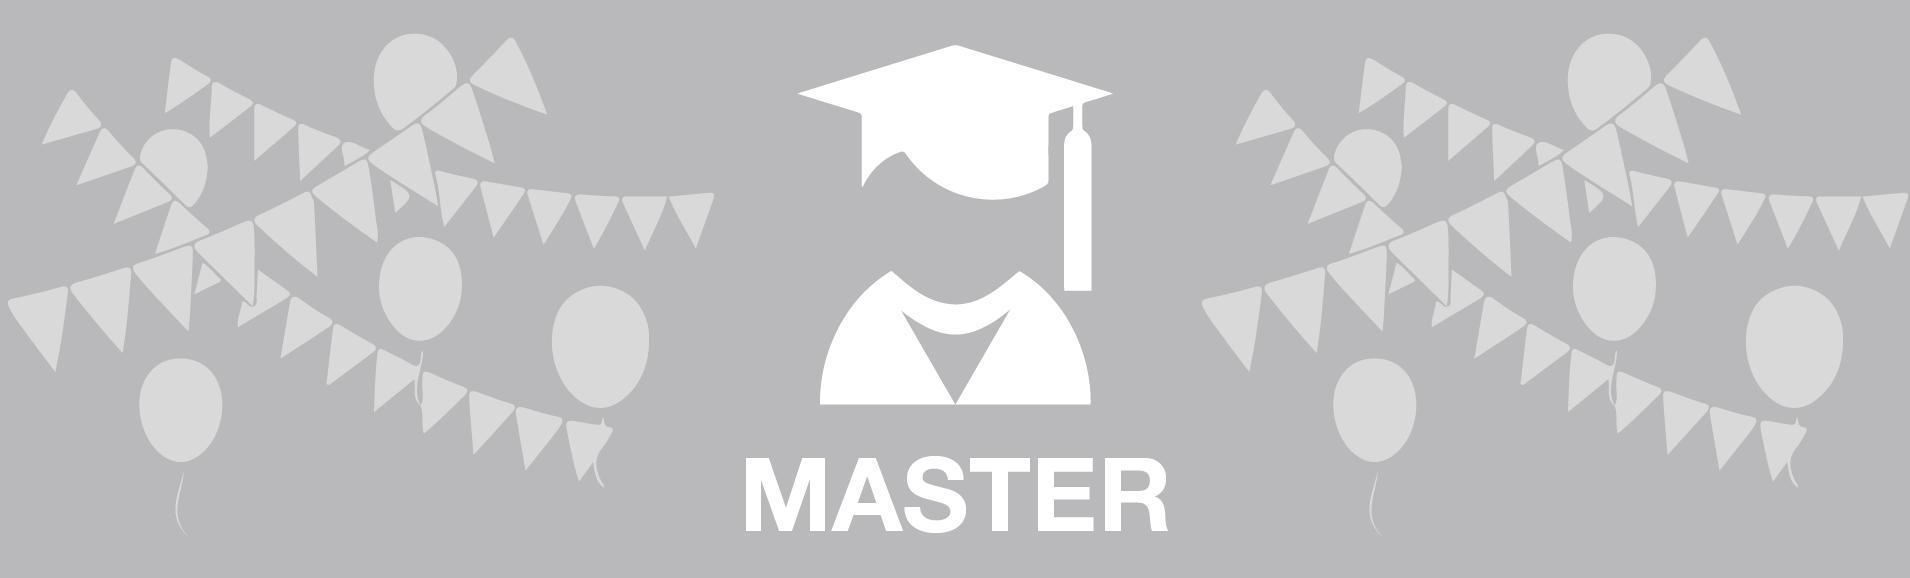 Wetrok Masterlehrgang: Congratulations!